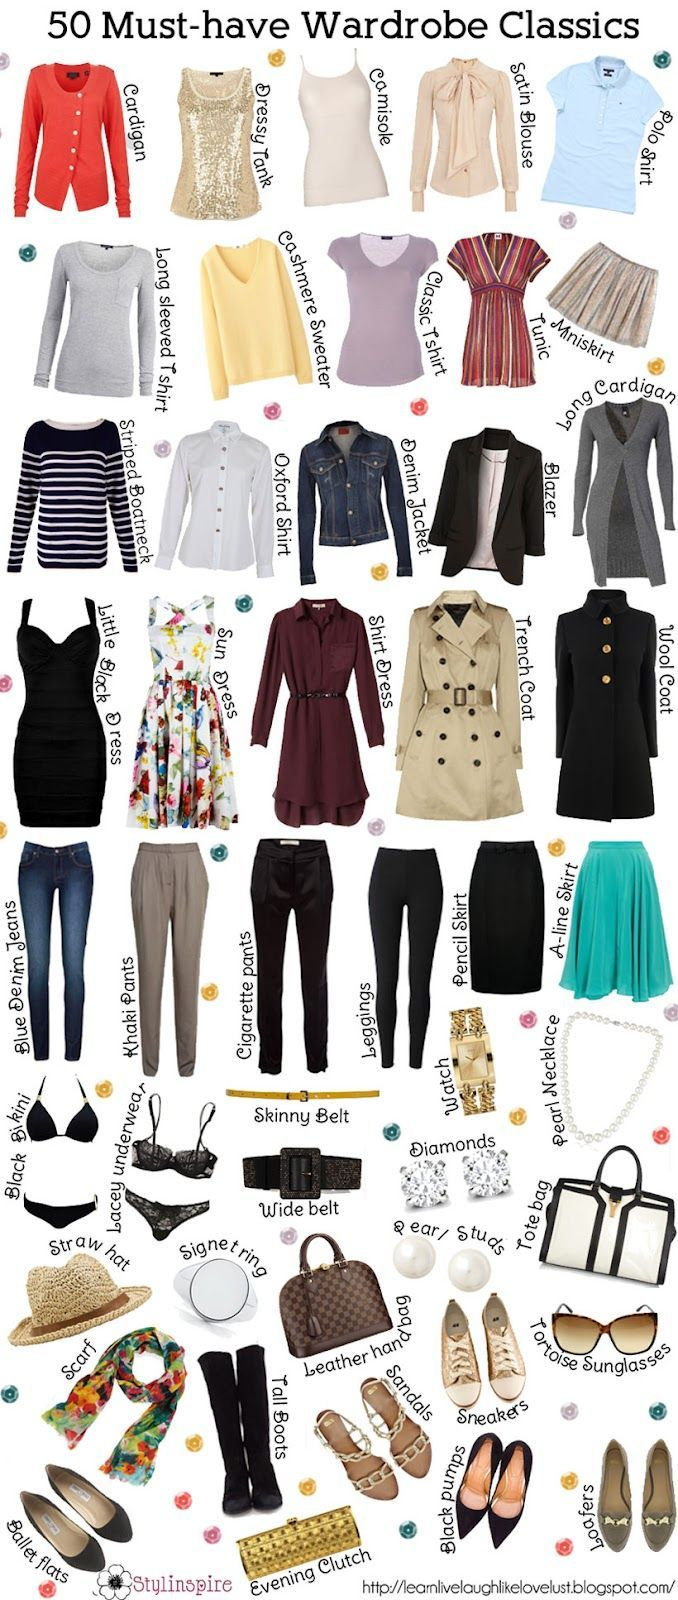 List of fashion items